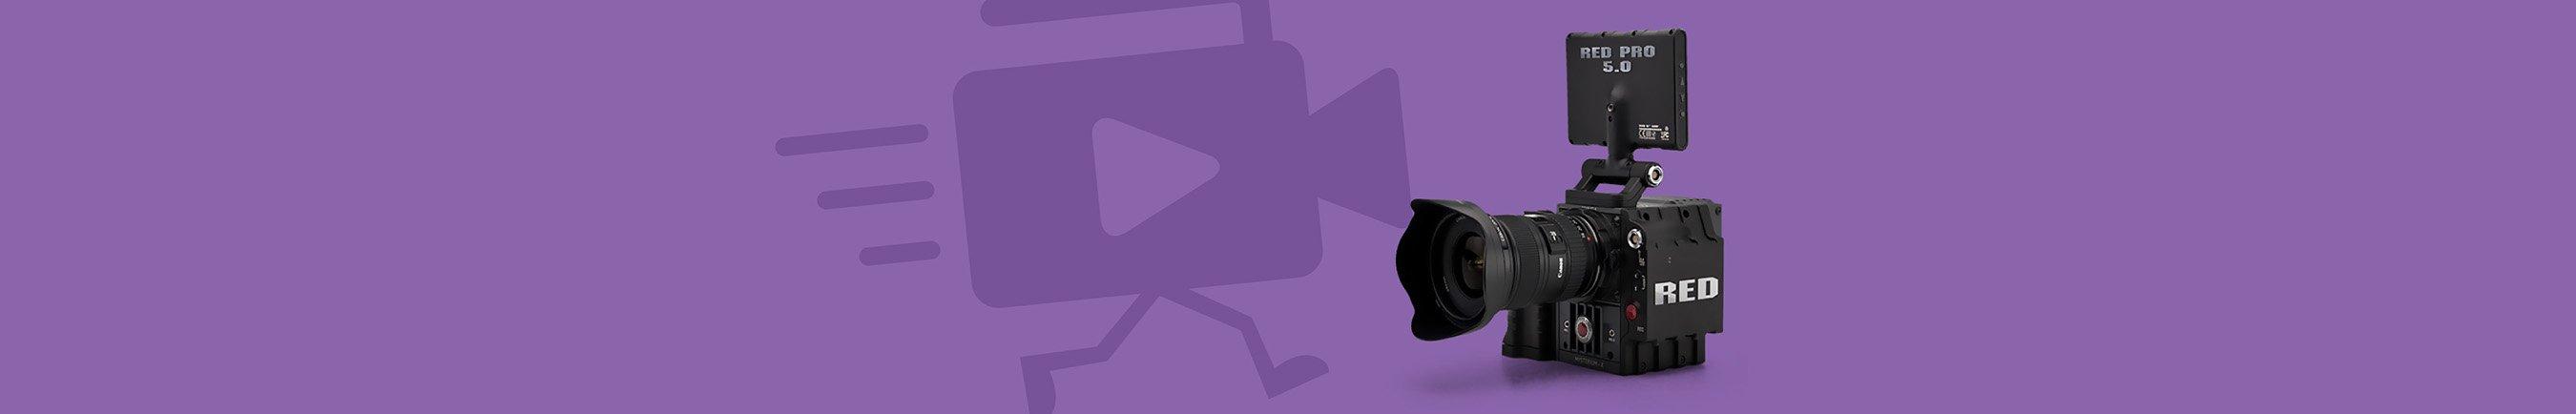 AP-Media-Video-Production-Slide